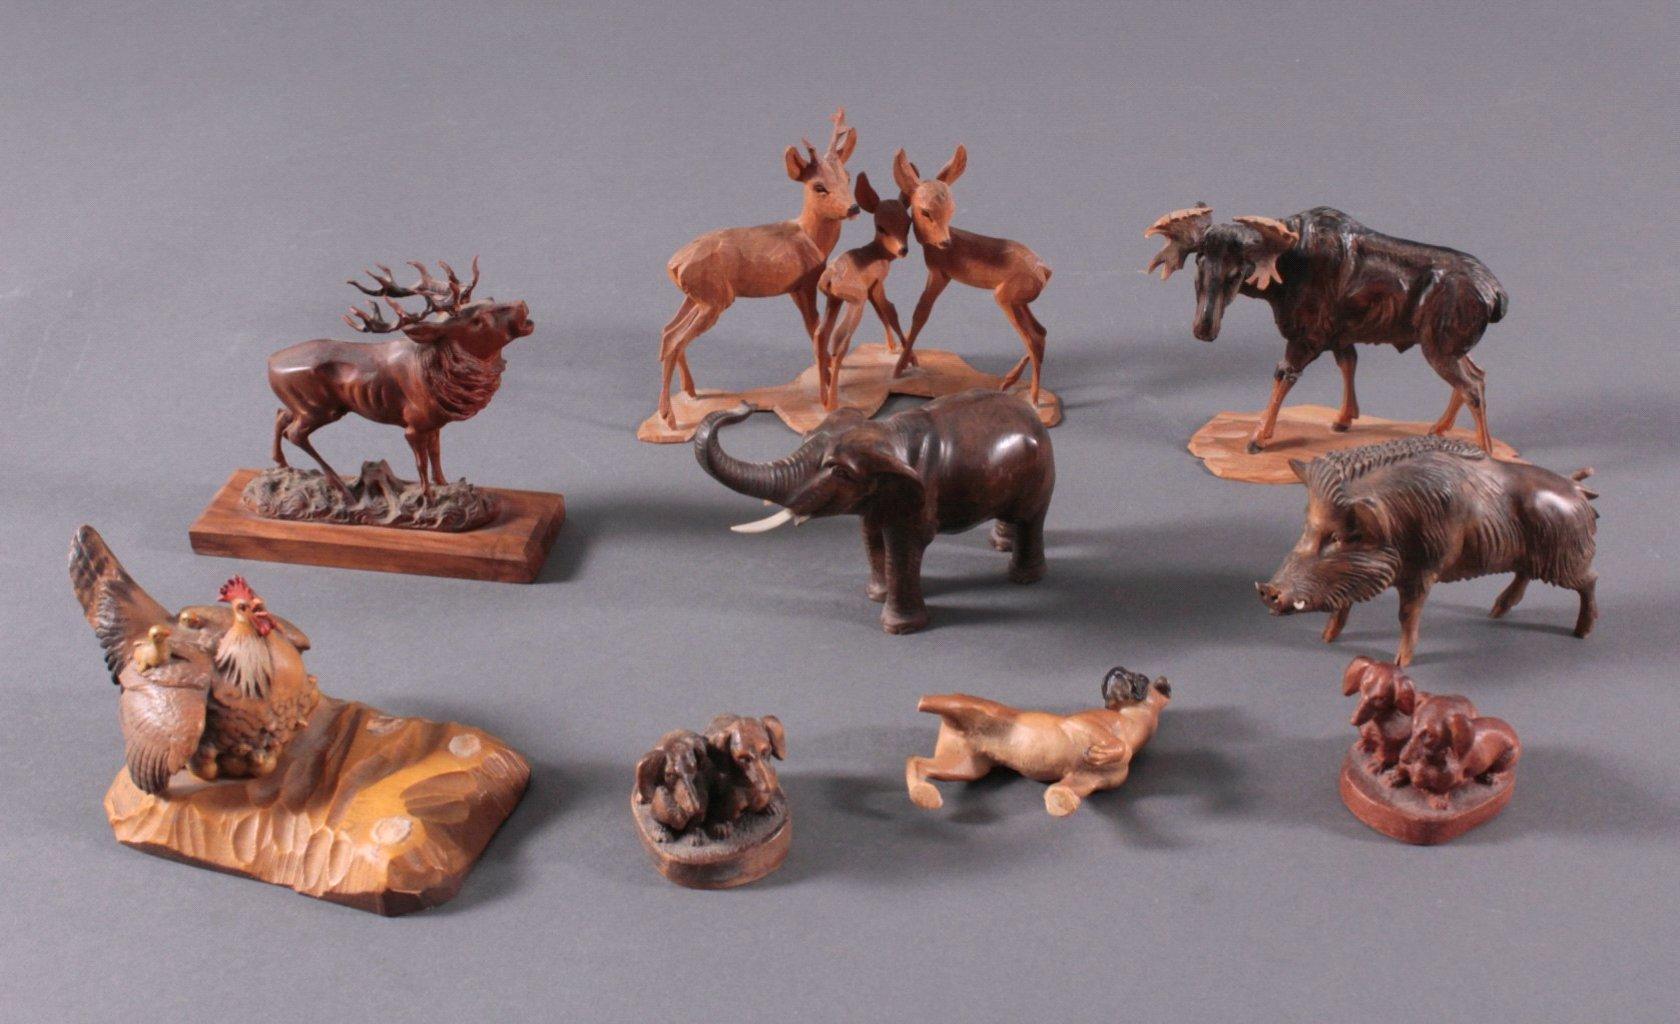 Neun Holz-Tierfiguren